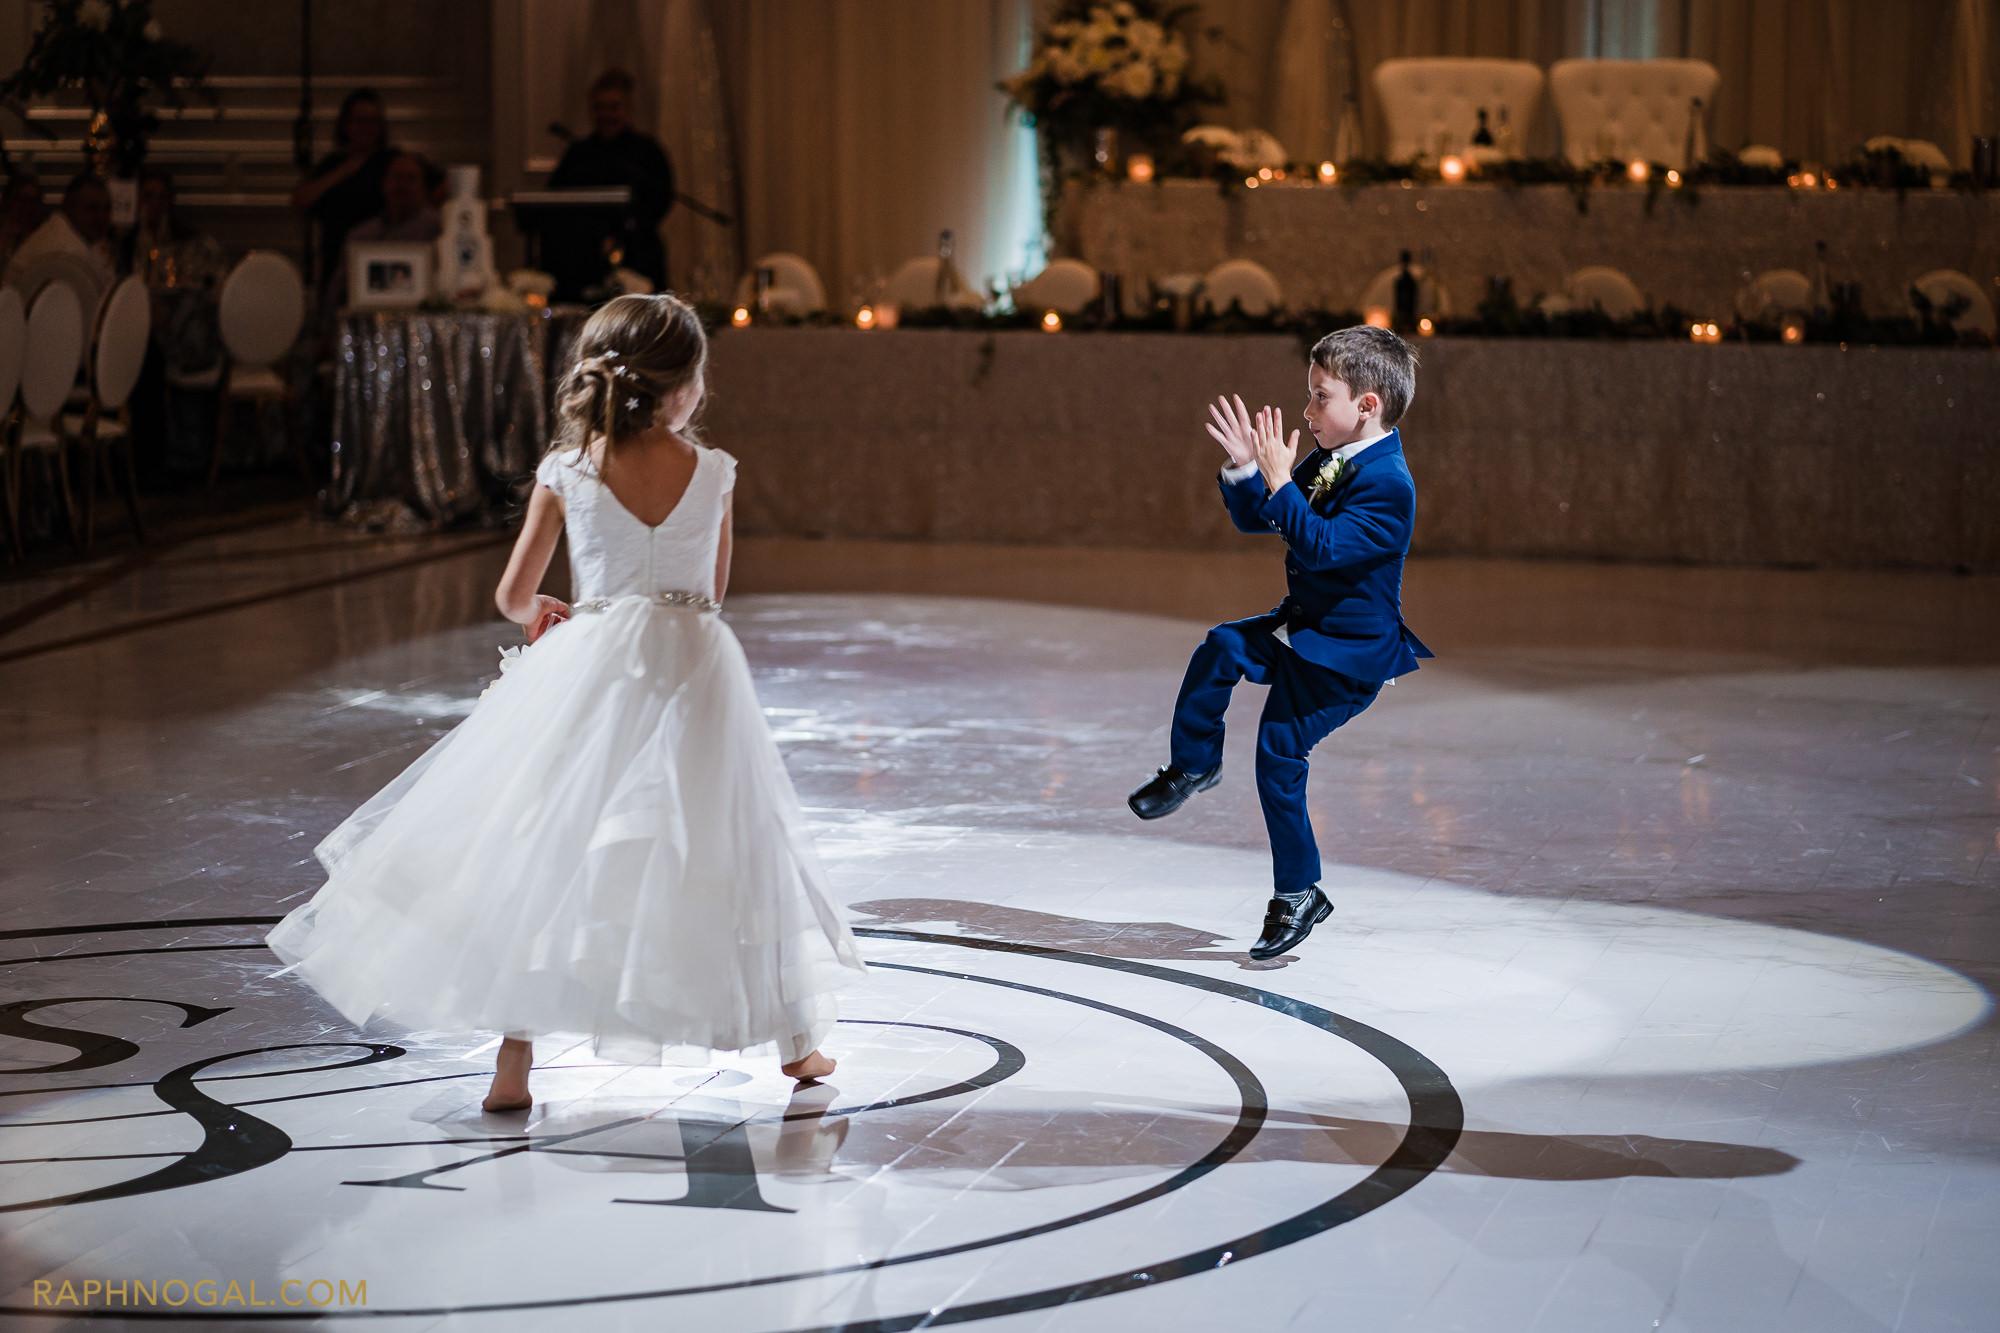 Ring boy and flower girl dance on the dance floor at Hazelton Manor